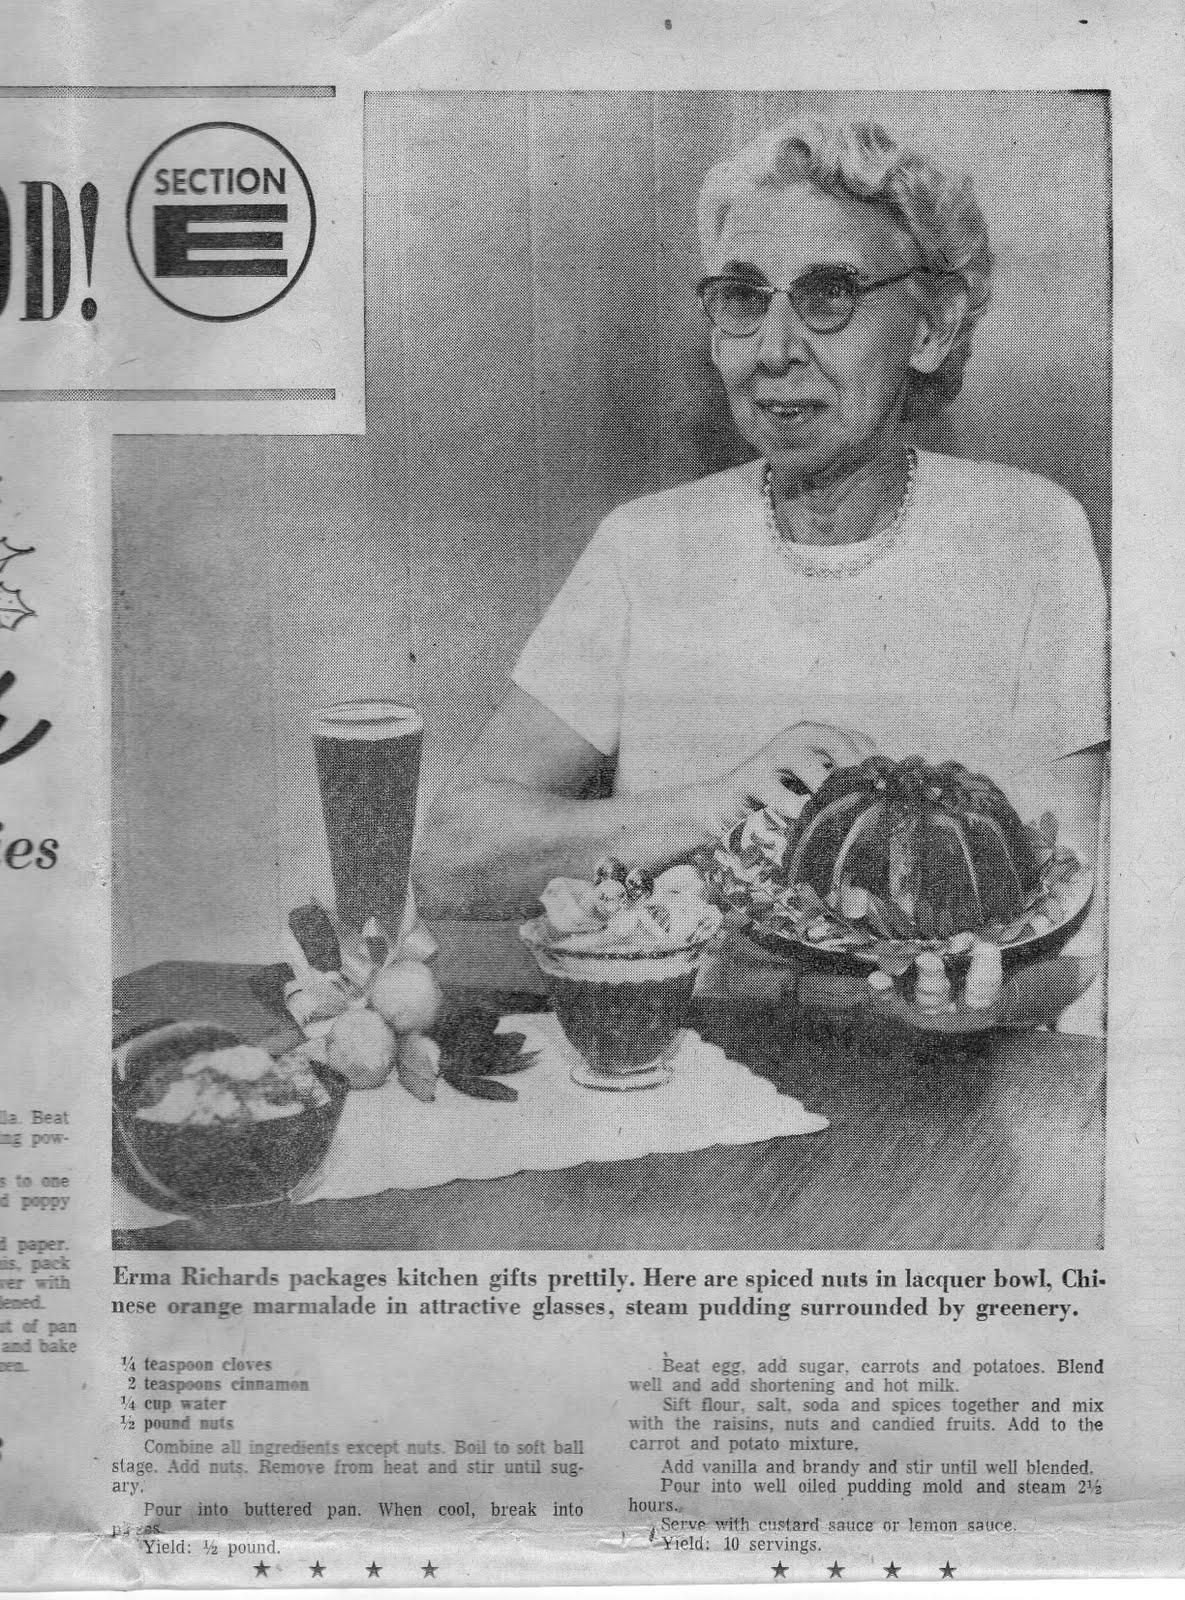 http://2.bp.blogspot.com/_Qi--WMgK648/TLJlr2Be-oI/AAAAAAAAYJM/LYdy6Wj1ALA/s1600/1959+November+Aunt+Erma+in+paper002.jpg